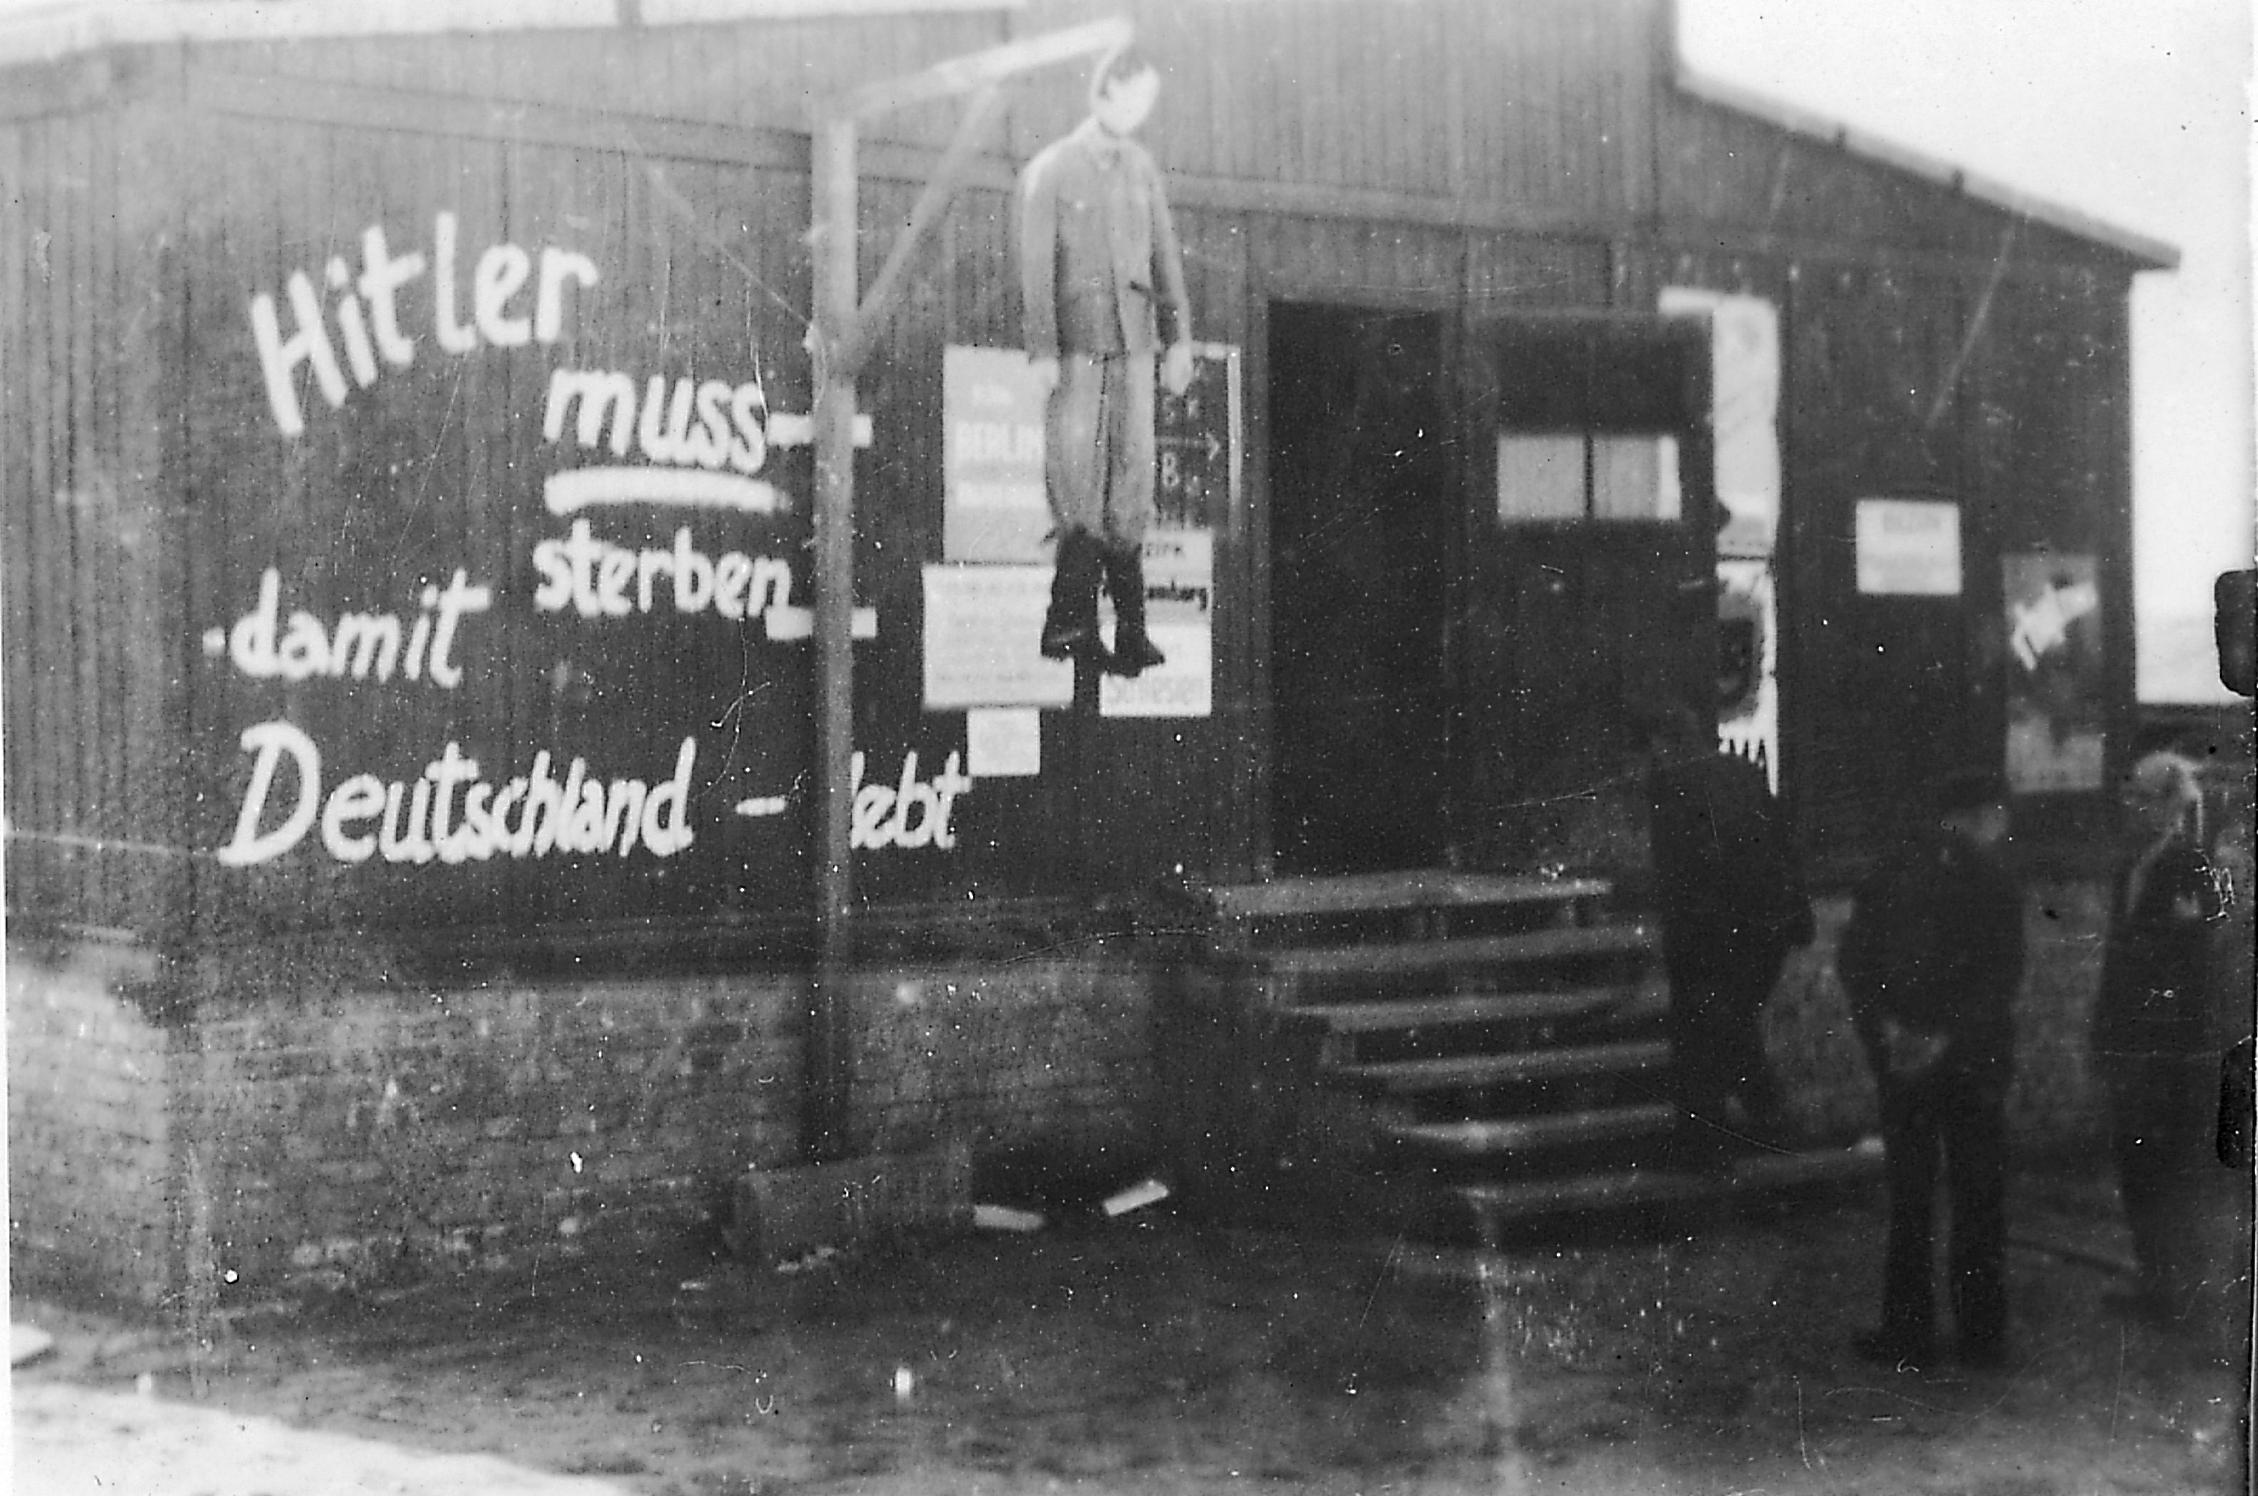 buchenwald concentration camp wikipedia download pdf